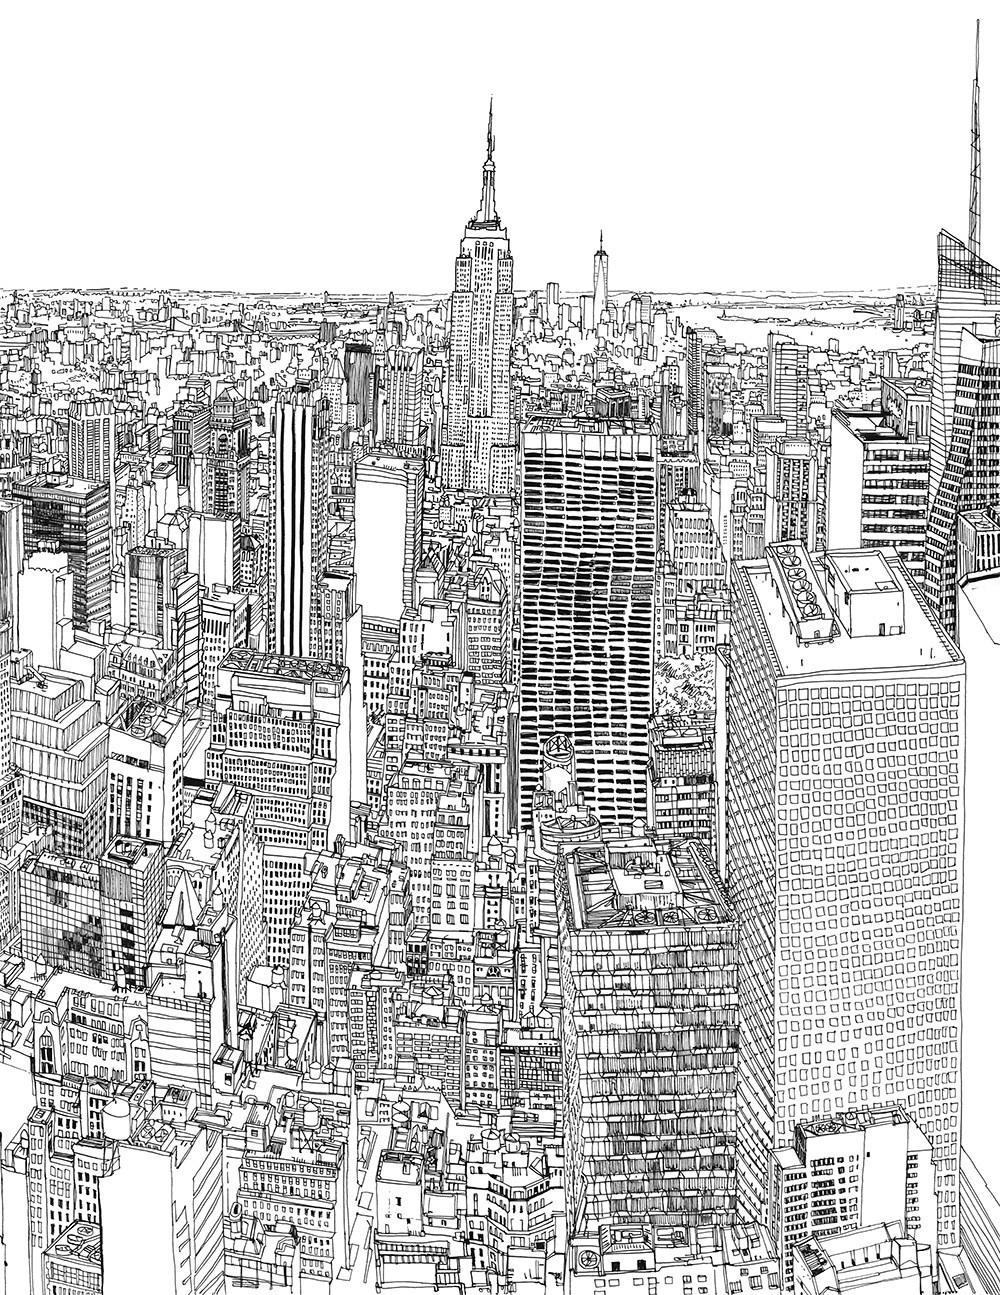 dessin-new-york-patrick-vale-colossus-zoom-02